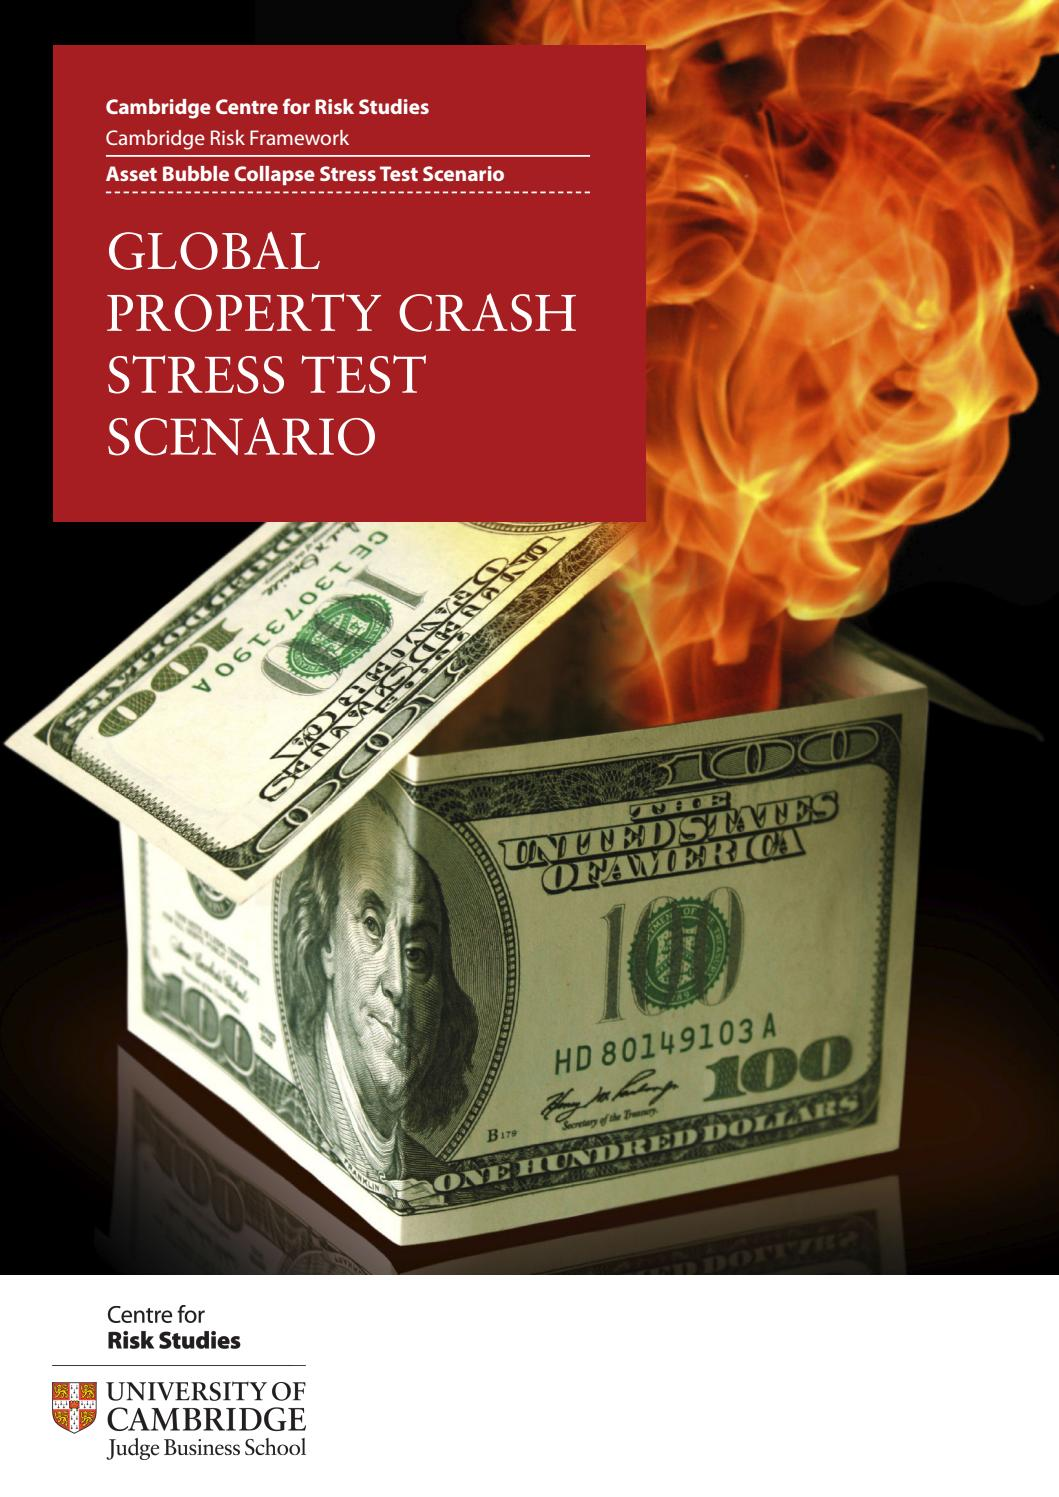 Global property crash financial catastrophe by Cambridge